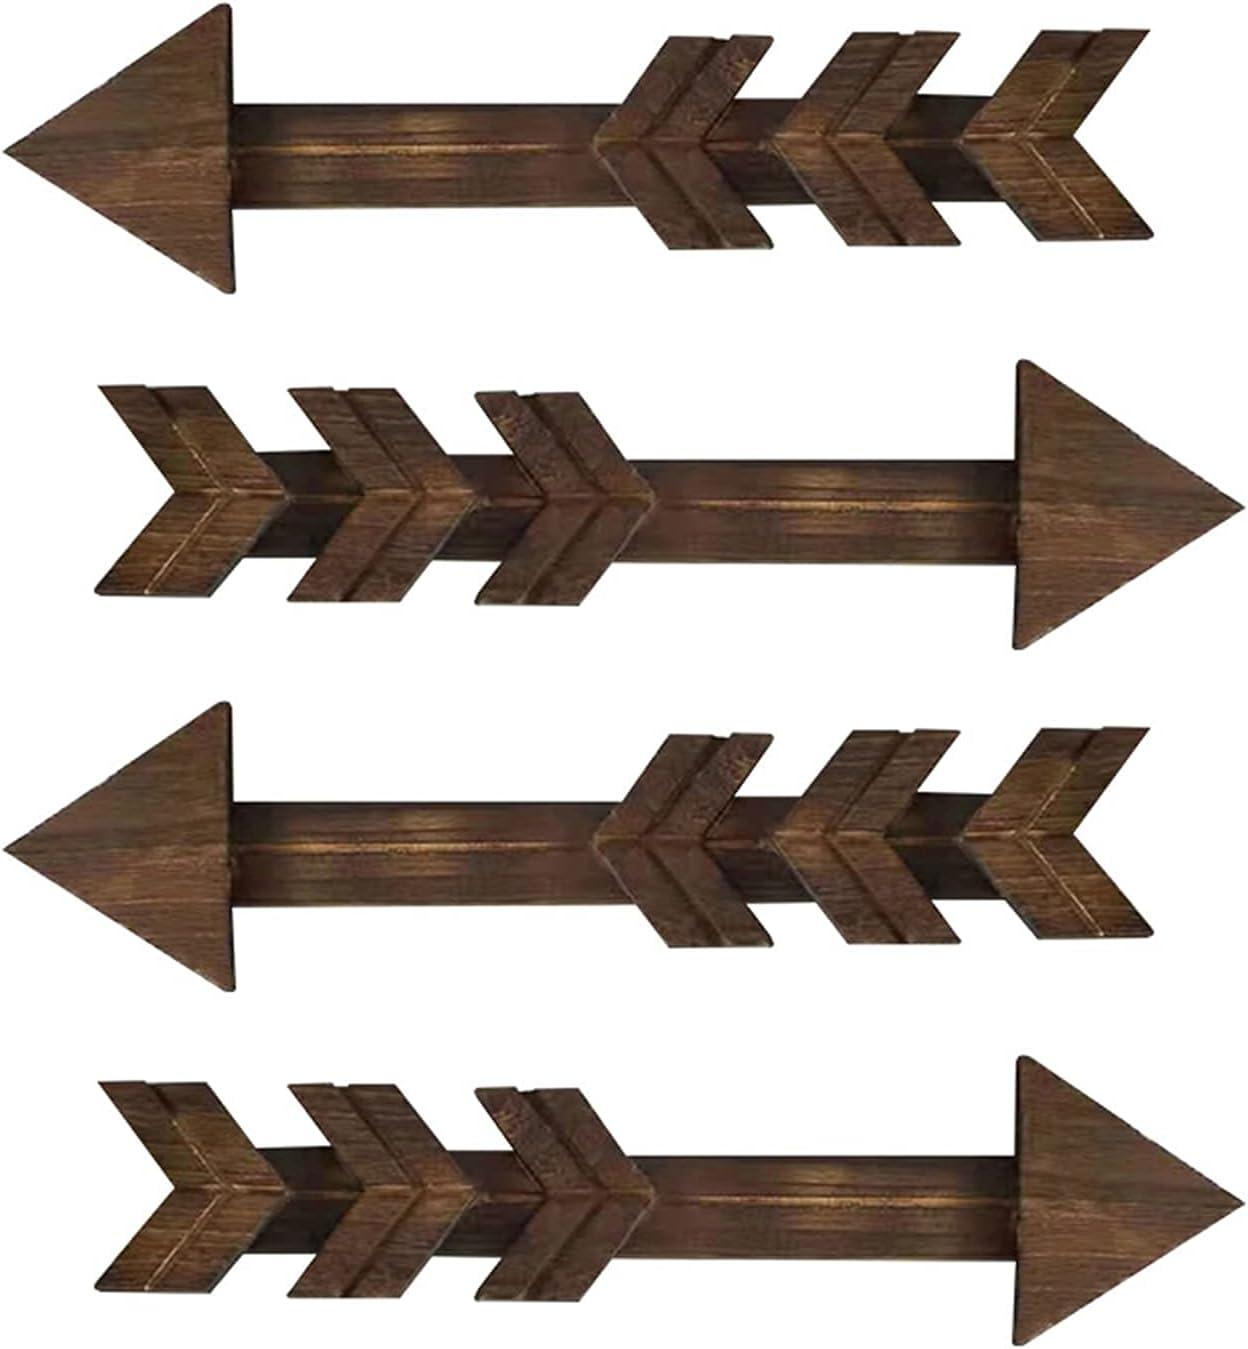 Fees free!! LLC- SUDA Modern Metal Wall Wooden Arrow Ranking TOP8 Decor 4pcs